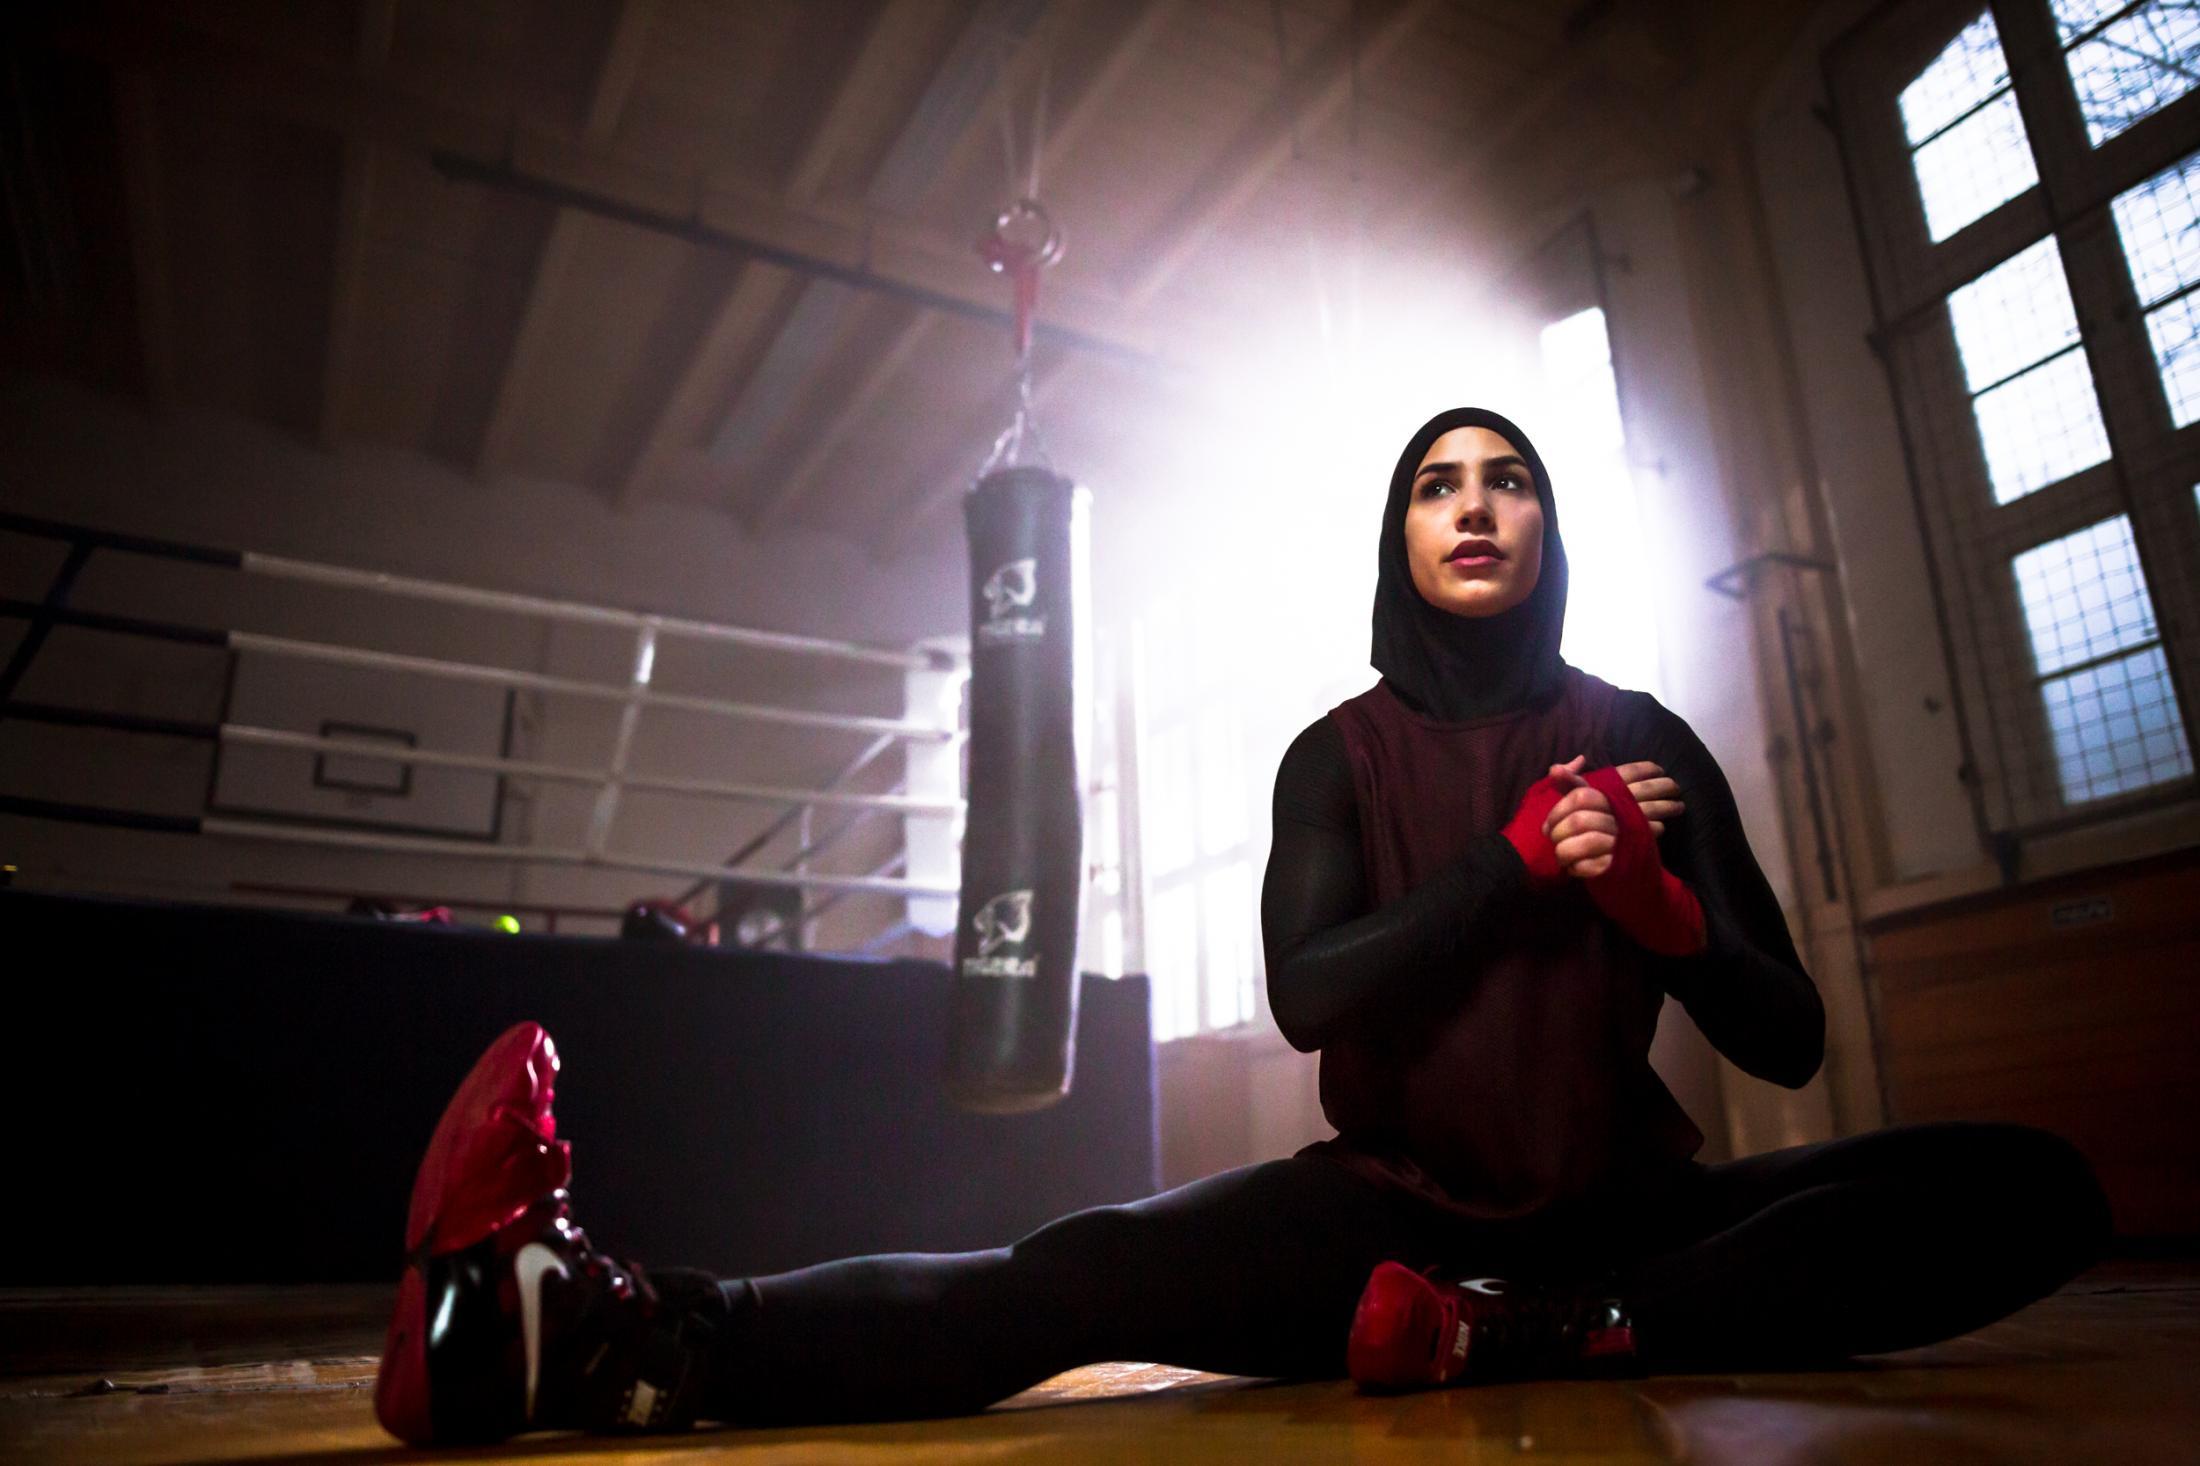 Zeina Nassar - German featherweight boxing champion